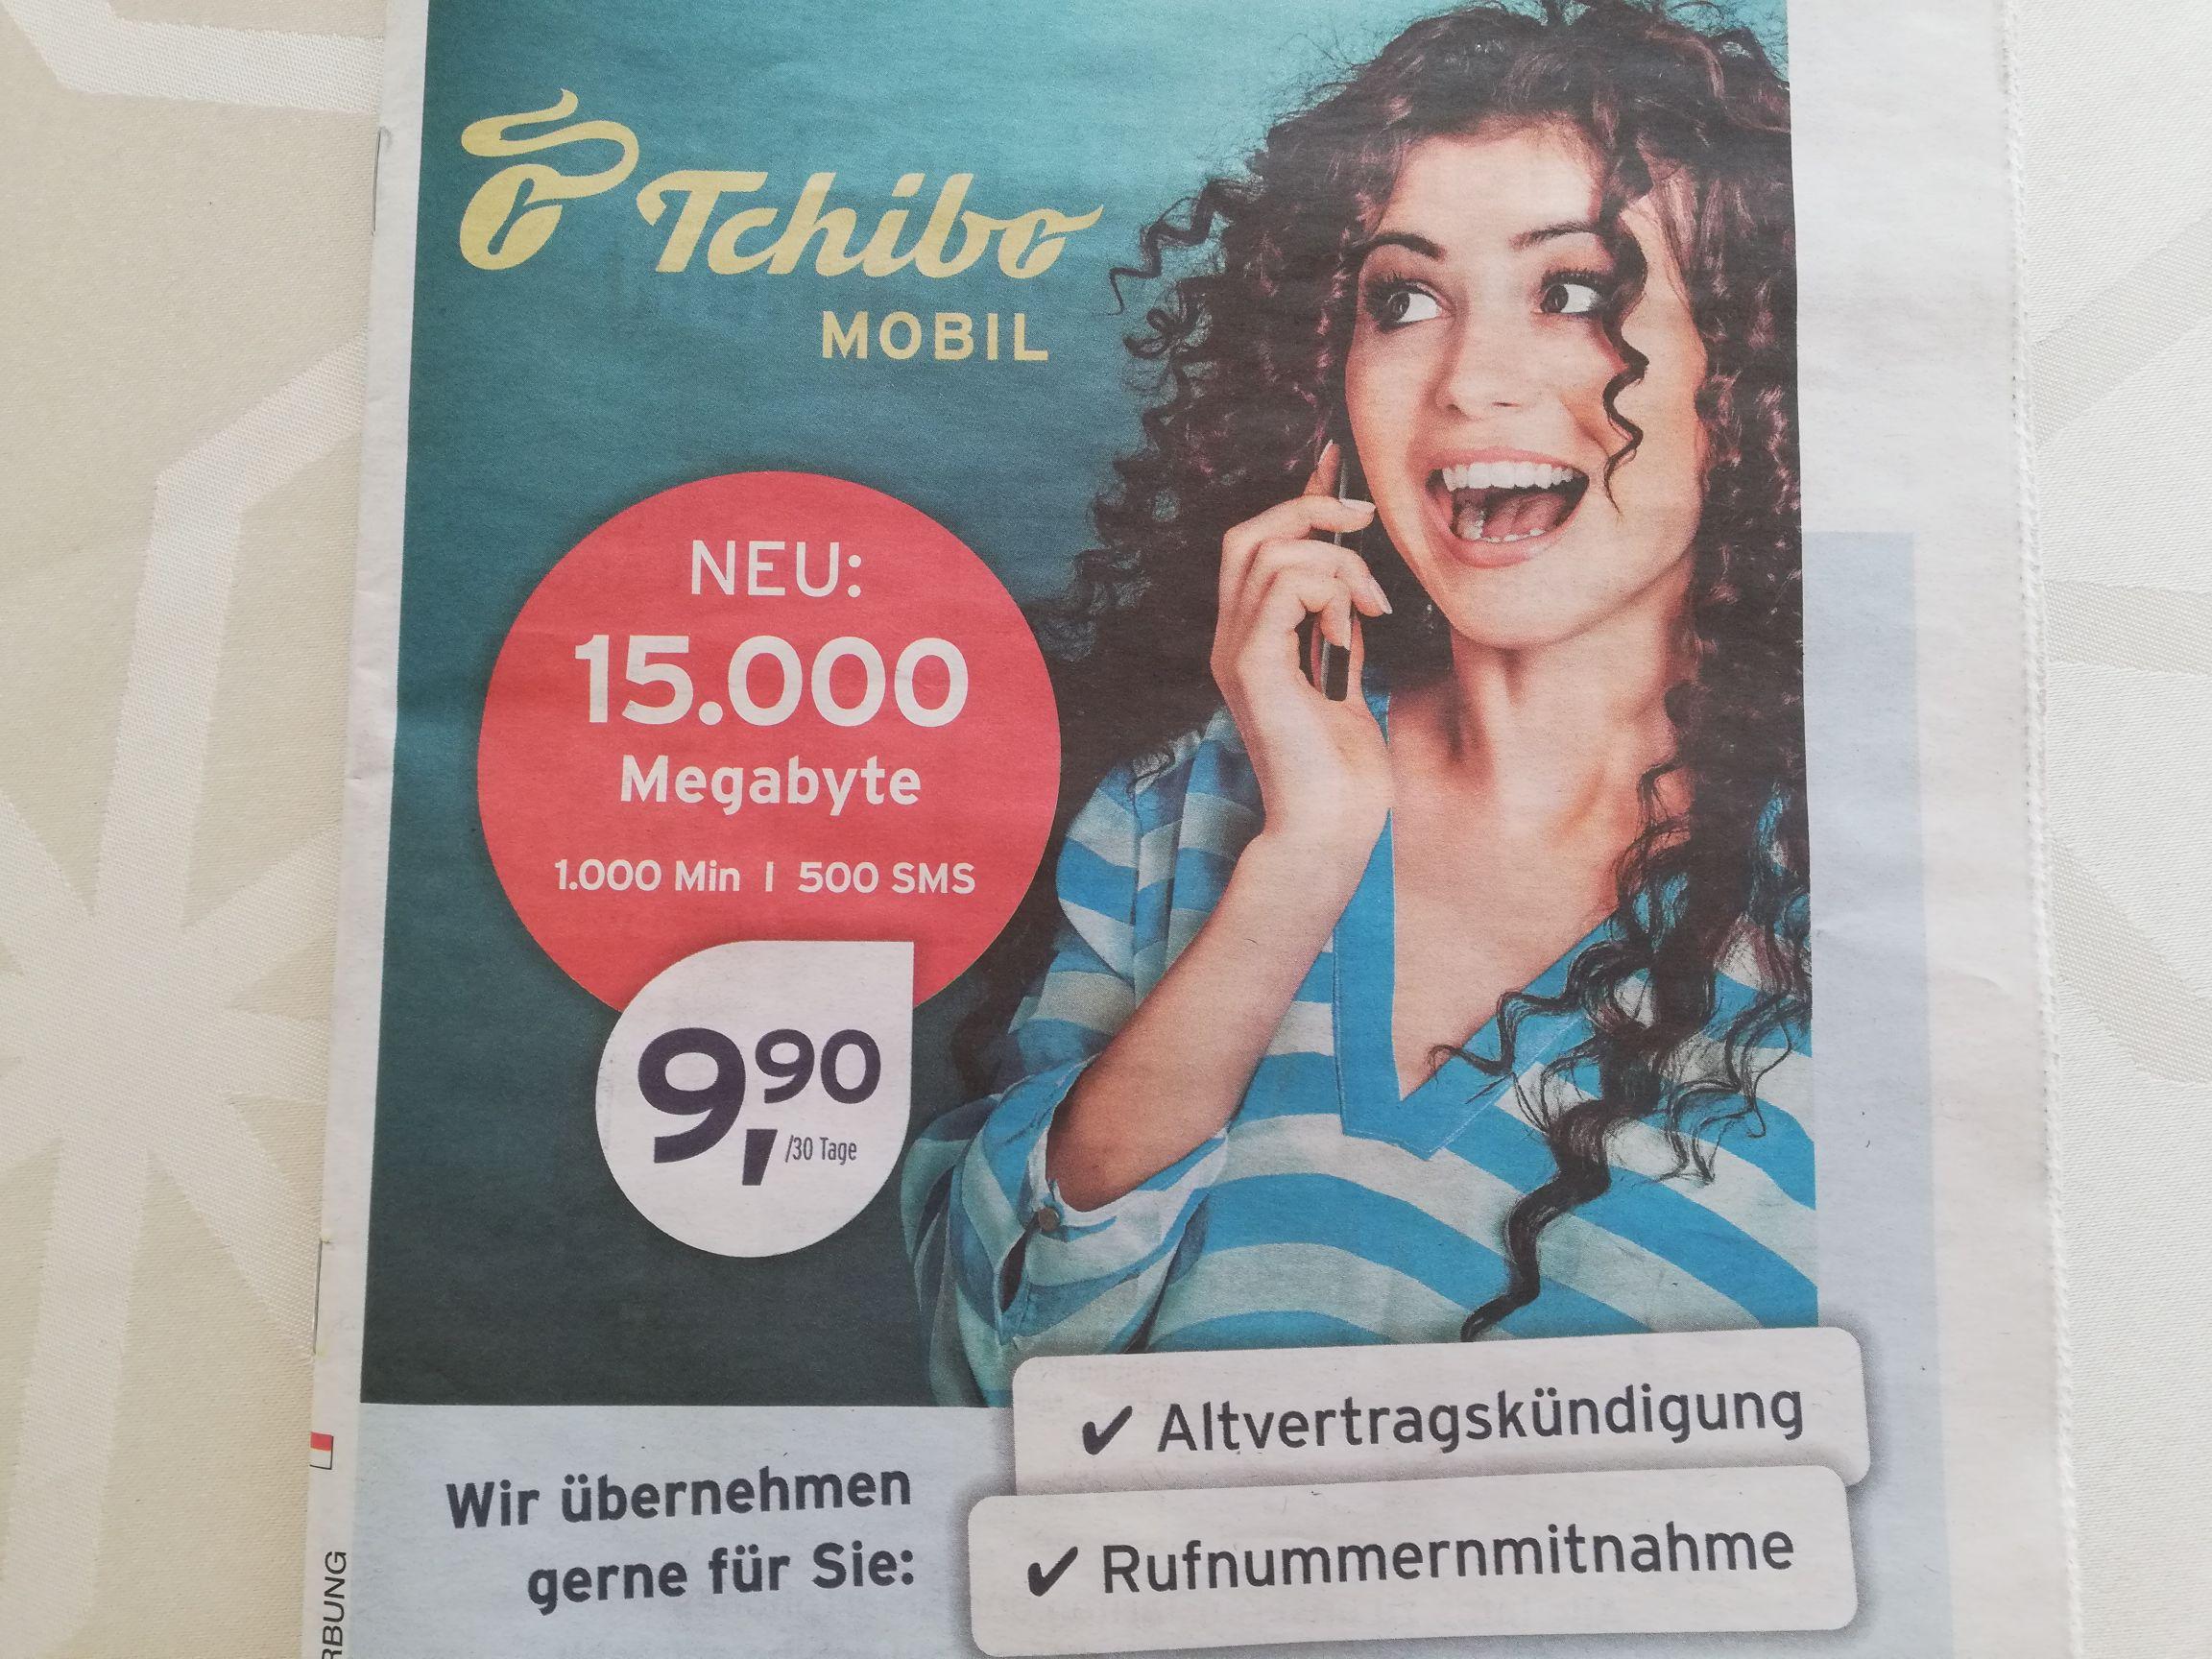 Tchibo Mobil Tarife z.B. 15 GB, 1000 min, 500 SMS für 9,90€   Preisjäger